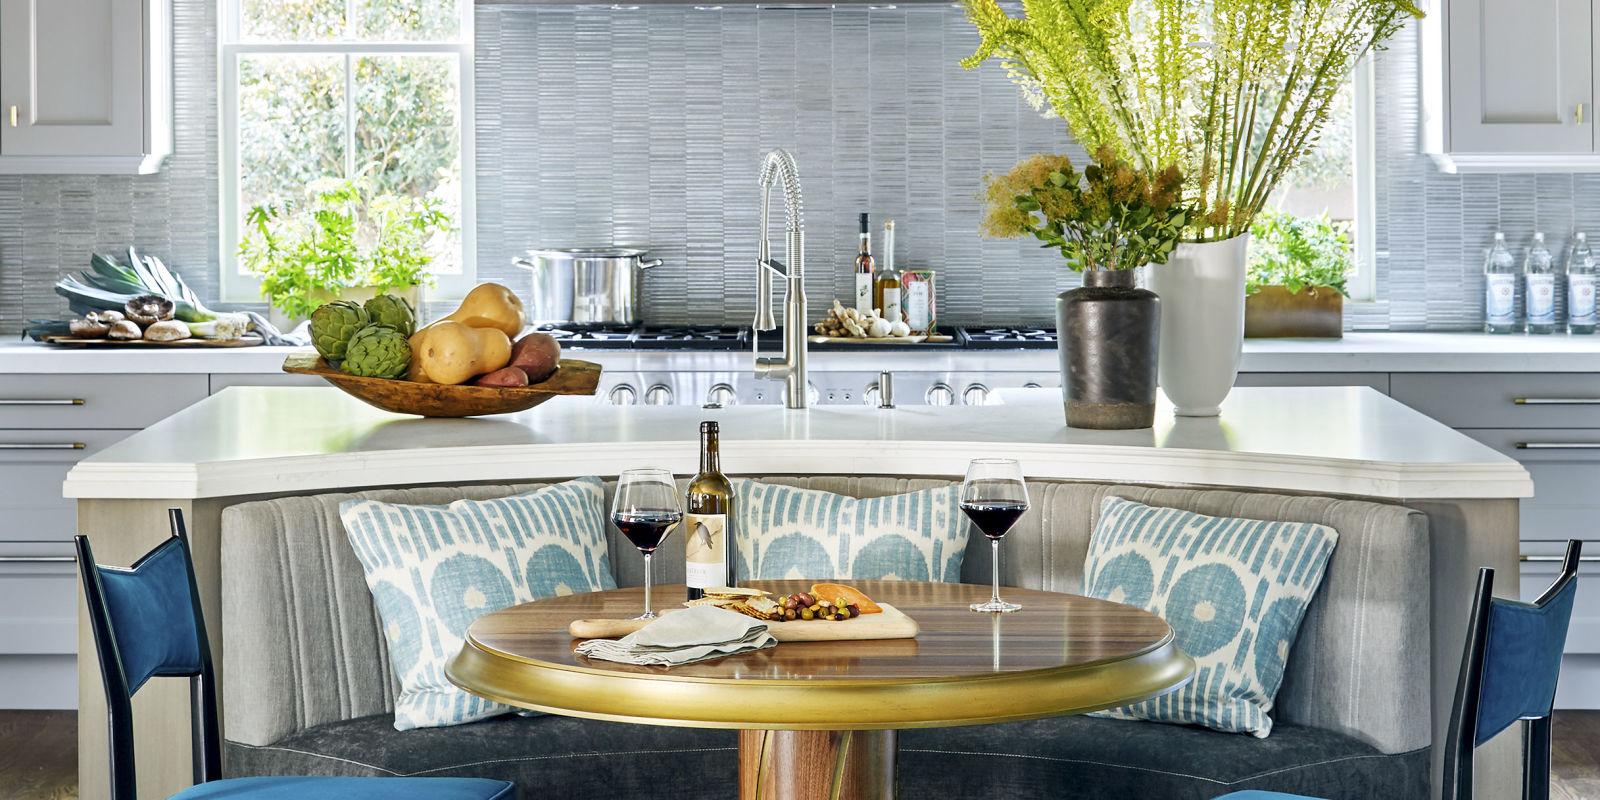 House Beautiful Kitchens 2016 Kitchen Of The Year Matthew Quinn